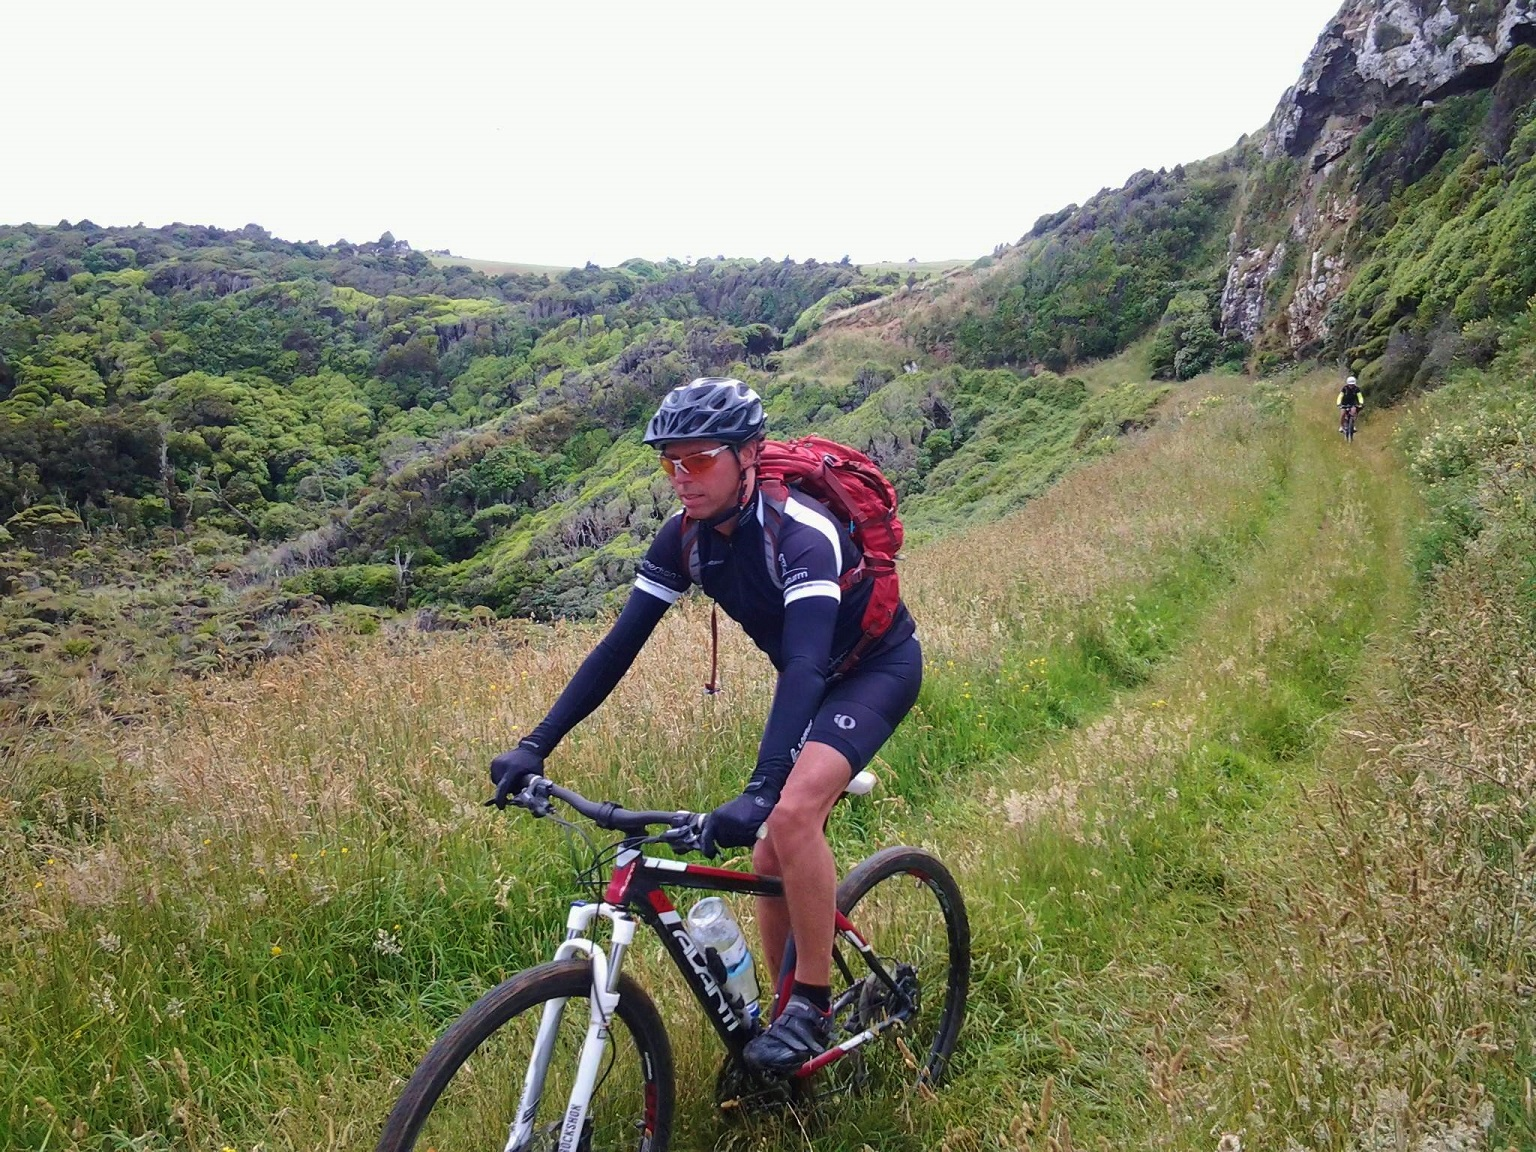 mountain biking in the Catlins